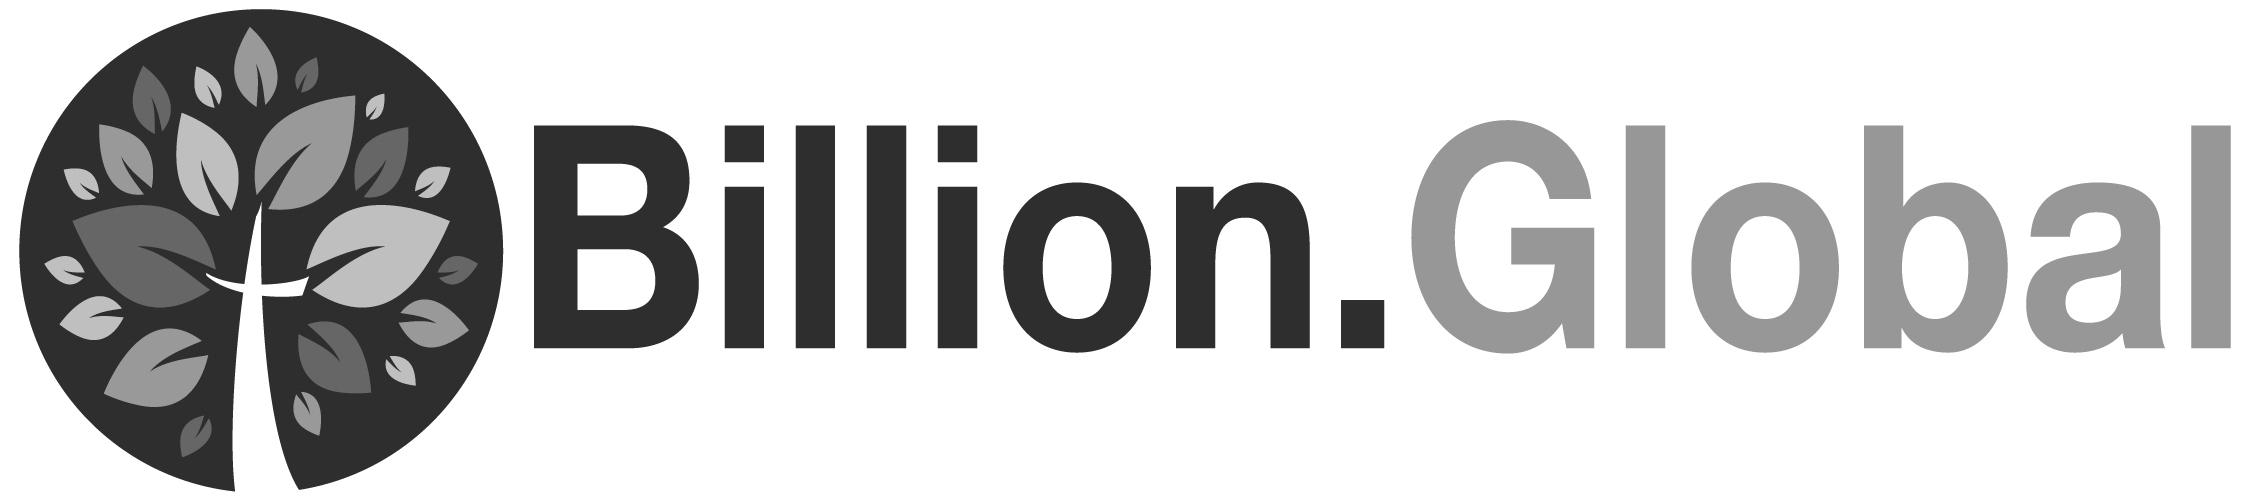 Billion Global